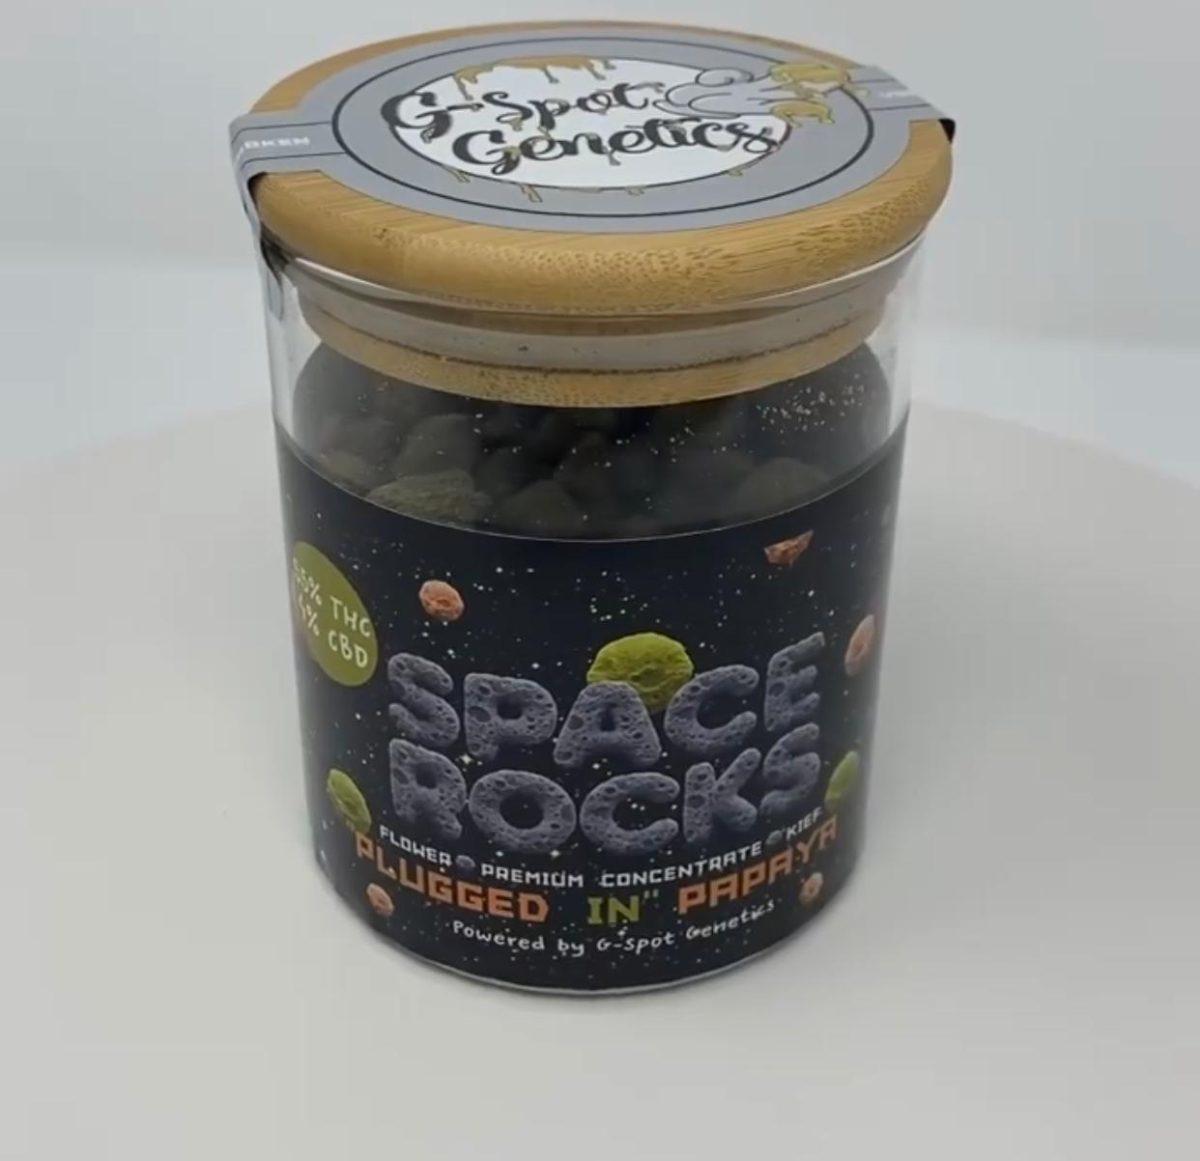 Buy Plugged In Papaya Space Rocks Online